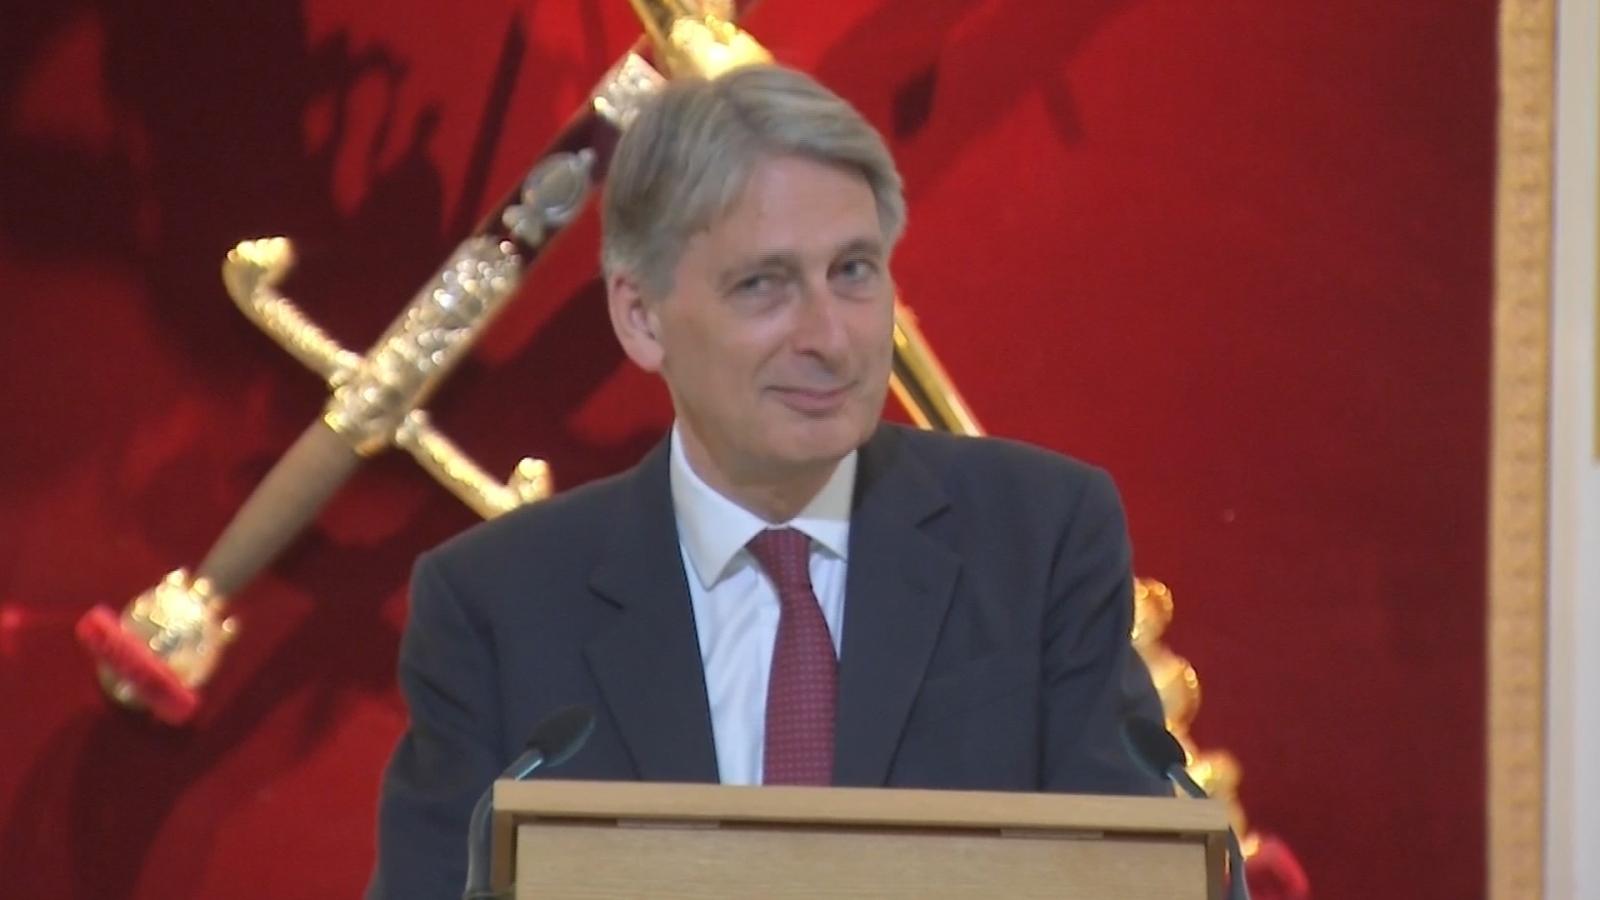 u-k-chancellor-philip-hammond-mocks-predecessor-george-osborne